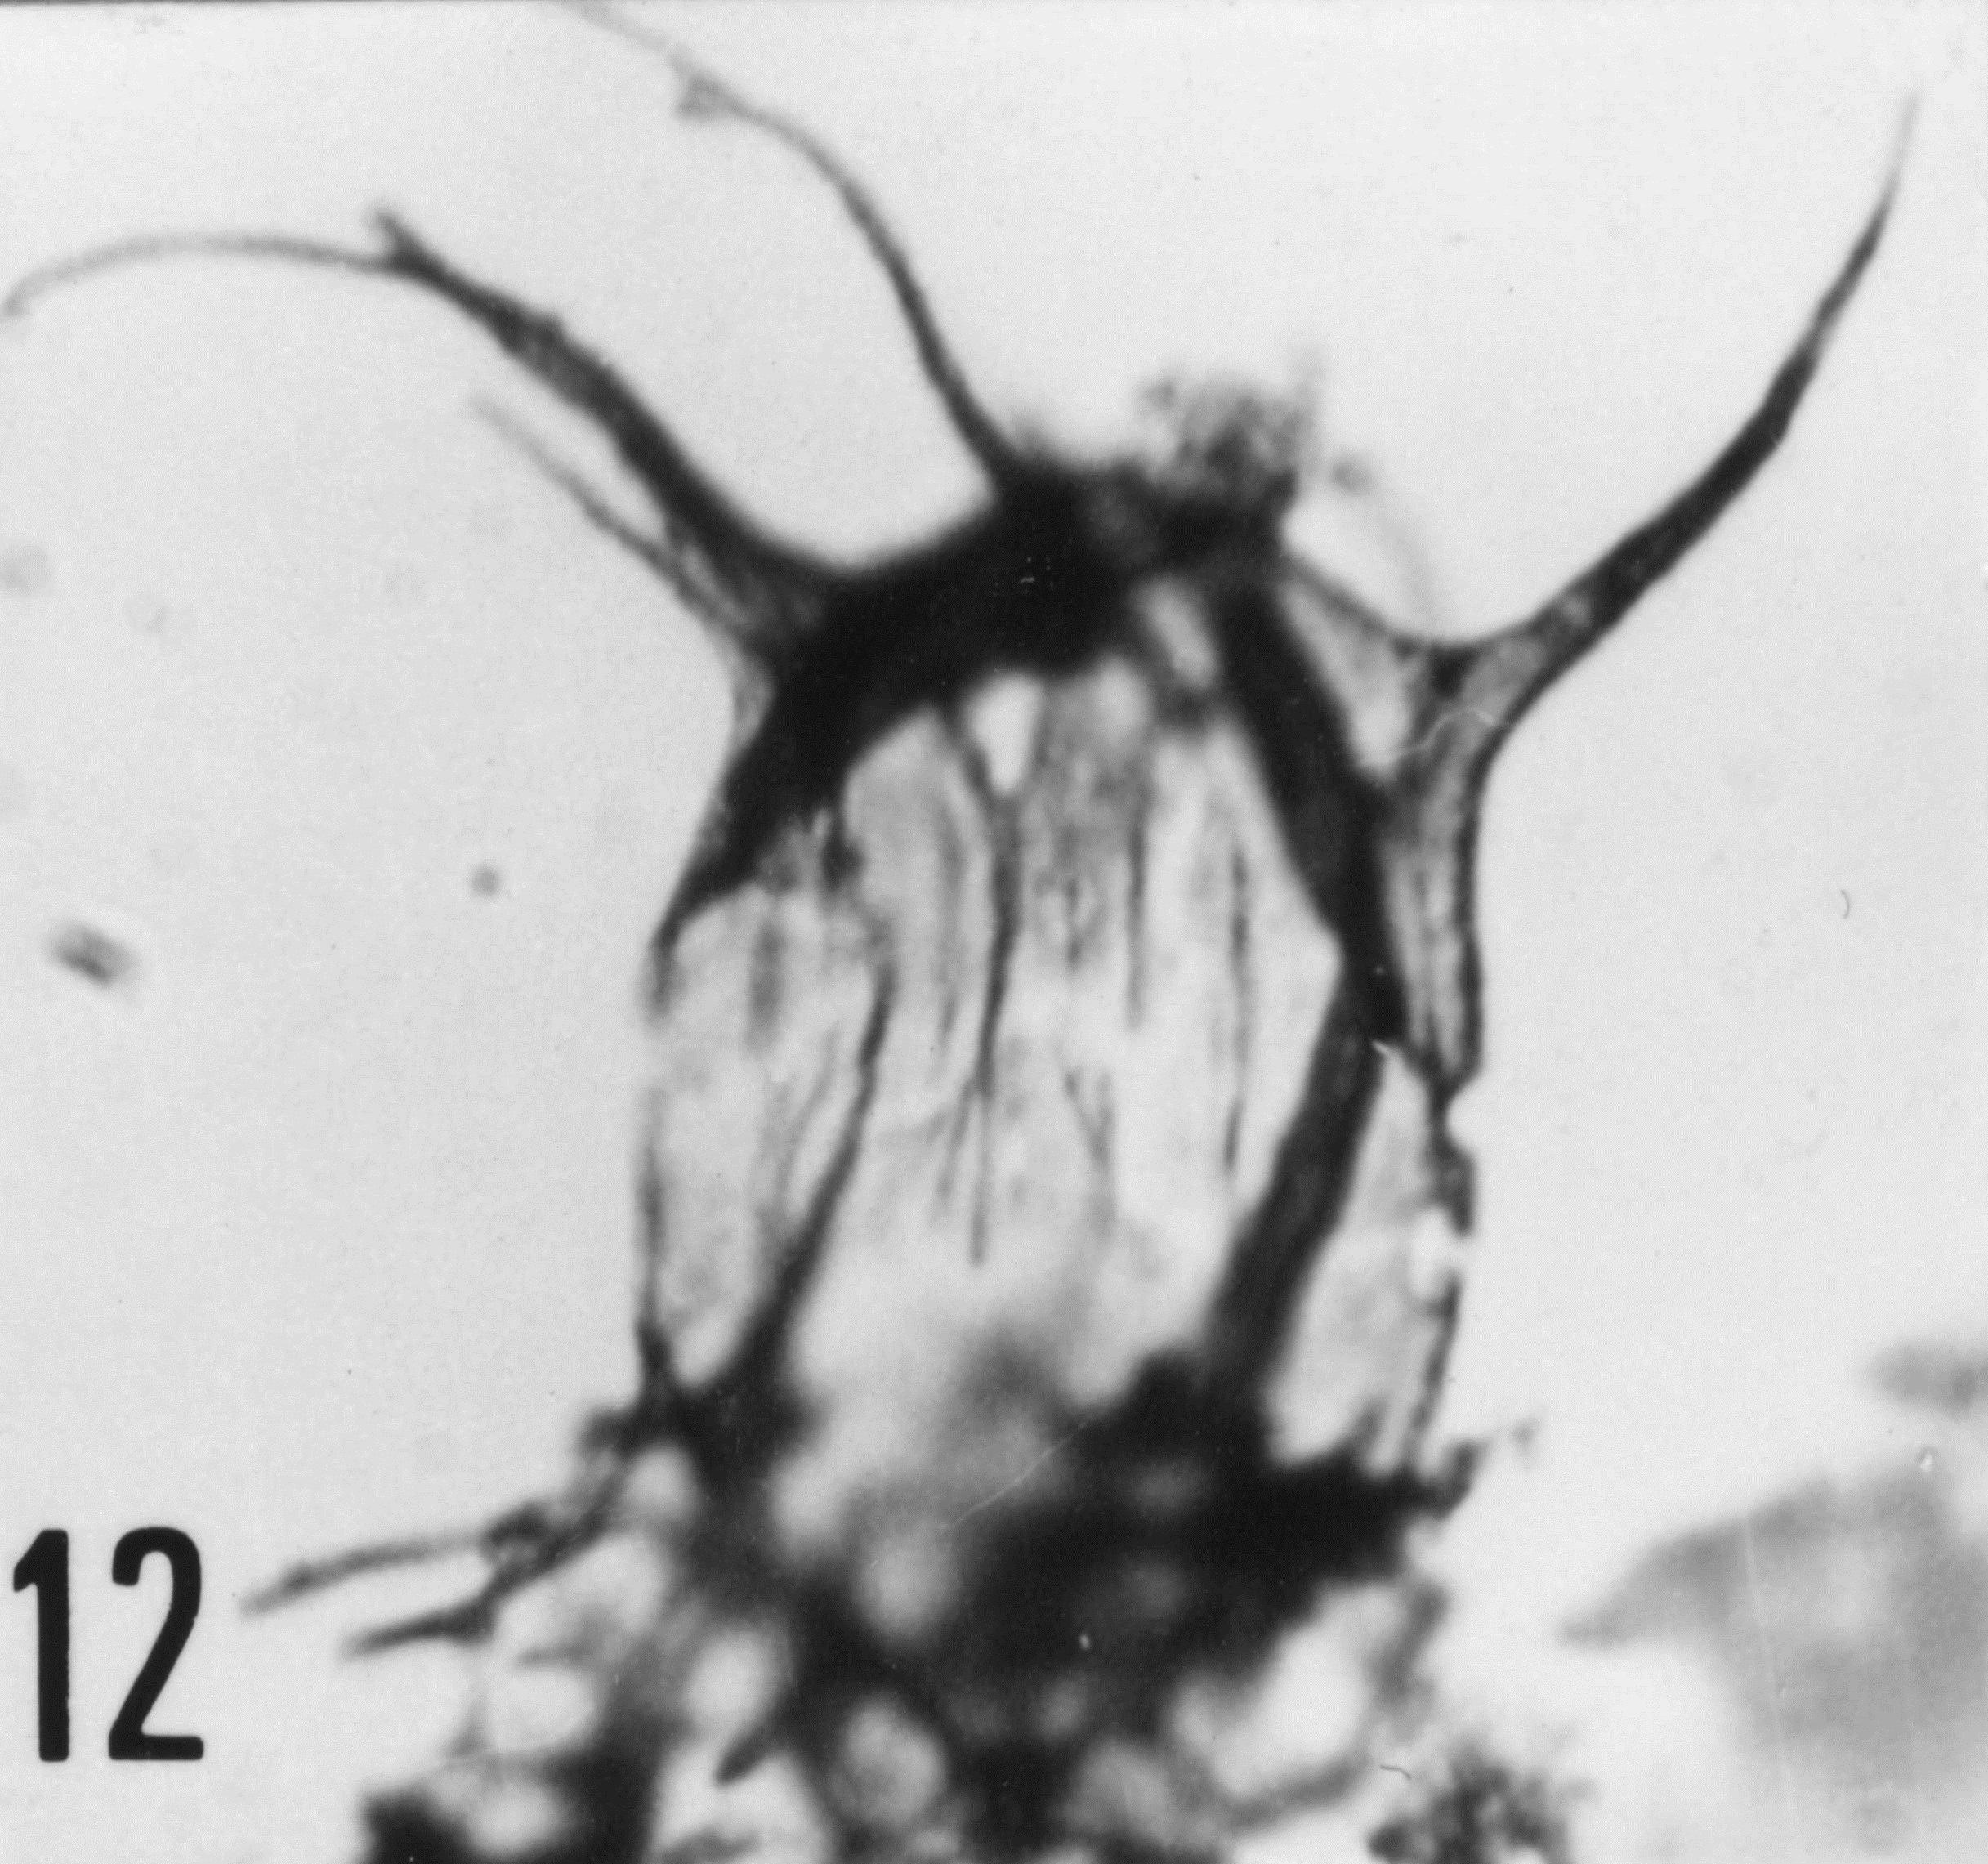 Fig. 12 - Arbusculidium filamentosum (Vavrdovâ, M., 1965) Vavrdovâ, M., 1972. VIL-3. I. R. Se. N. B. N° b516.